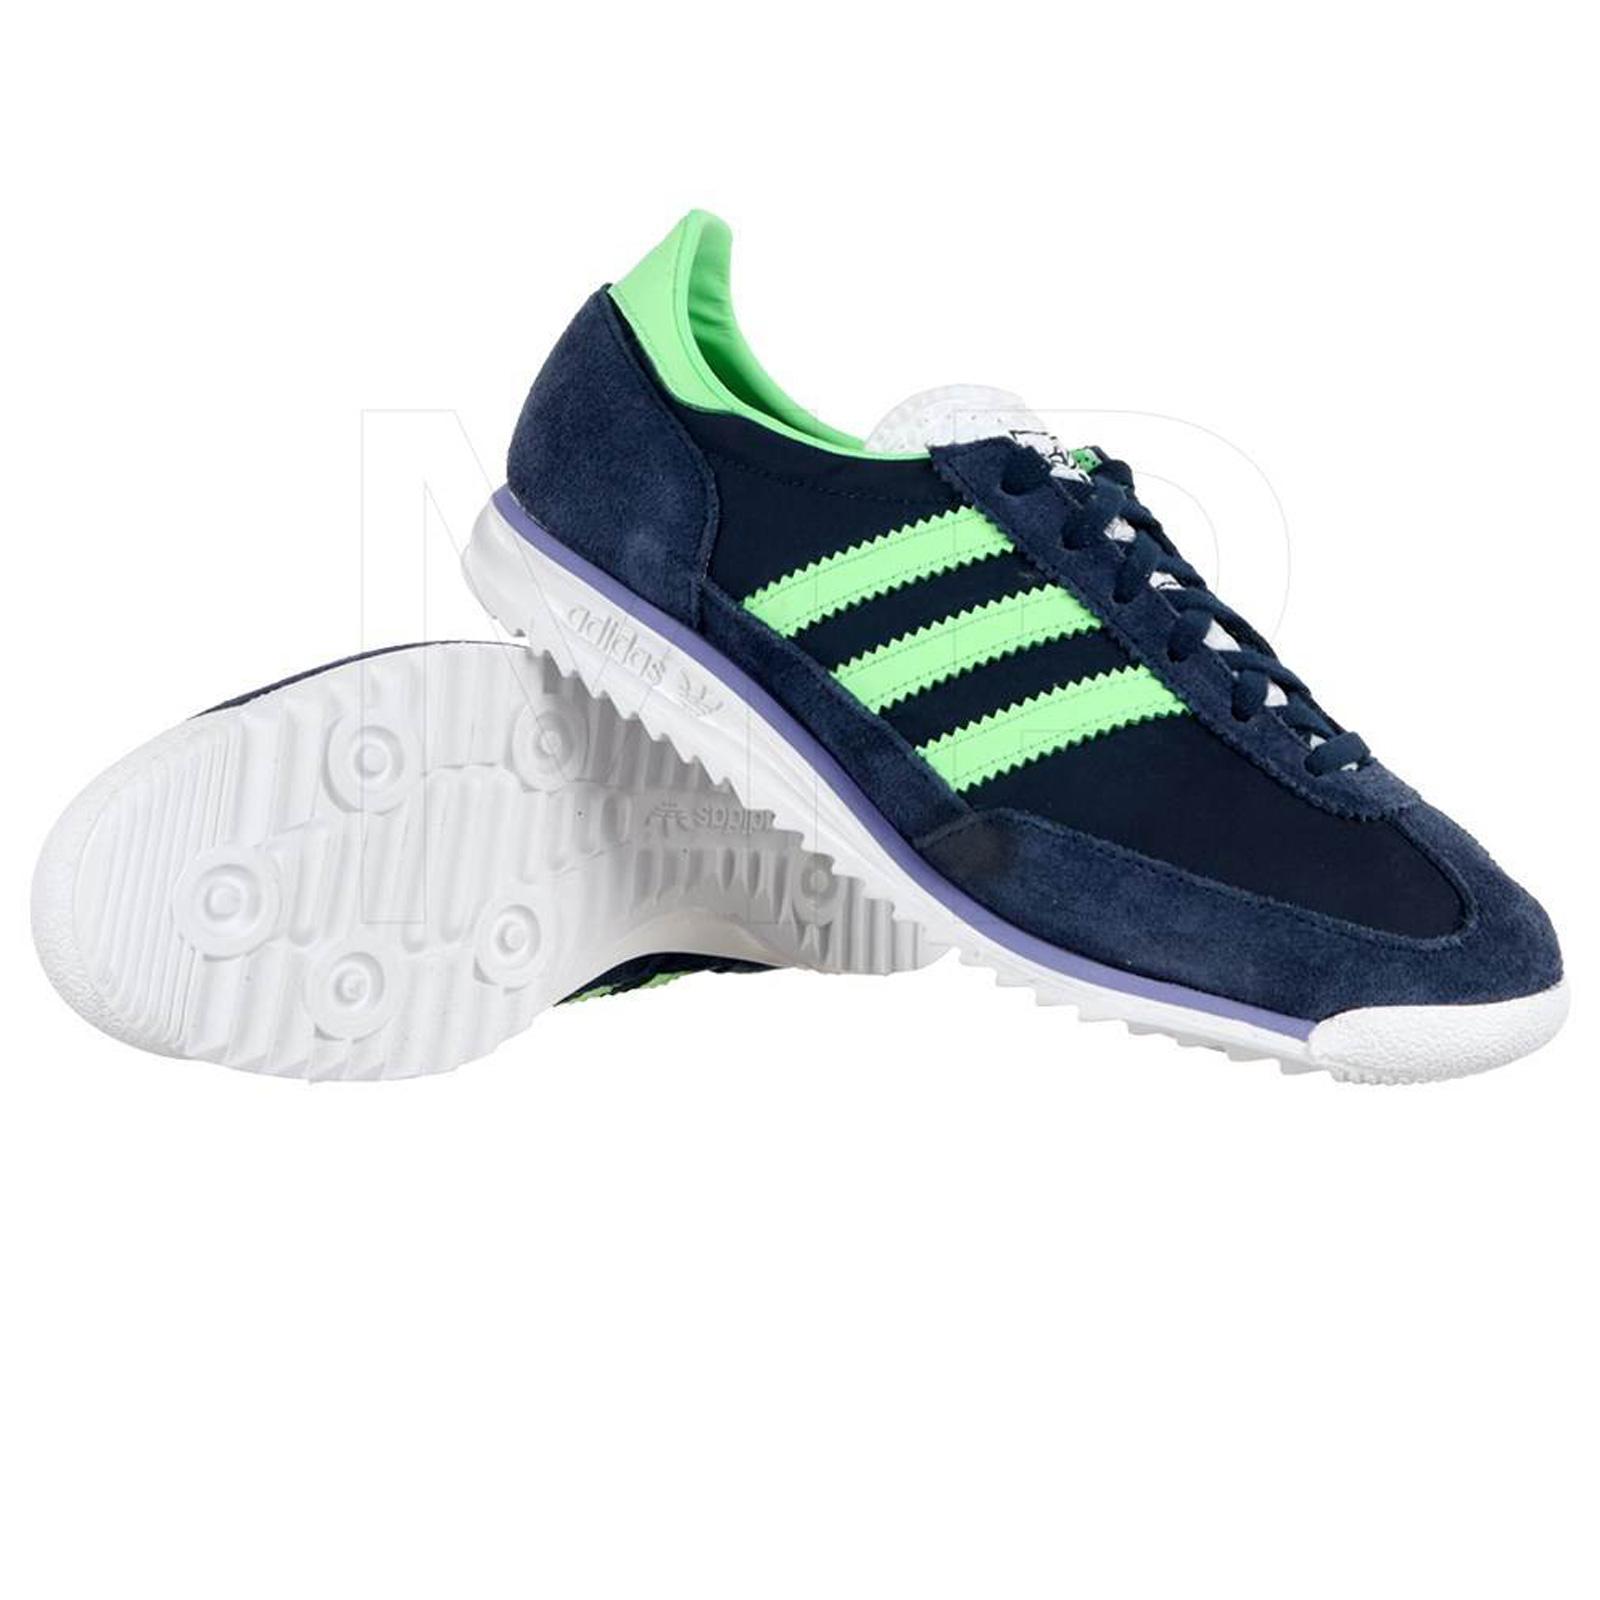 adidas Originals SL 72 Damen Sneaker Freizeit Turnschuhe M19226 Laufschuhe Navy